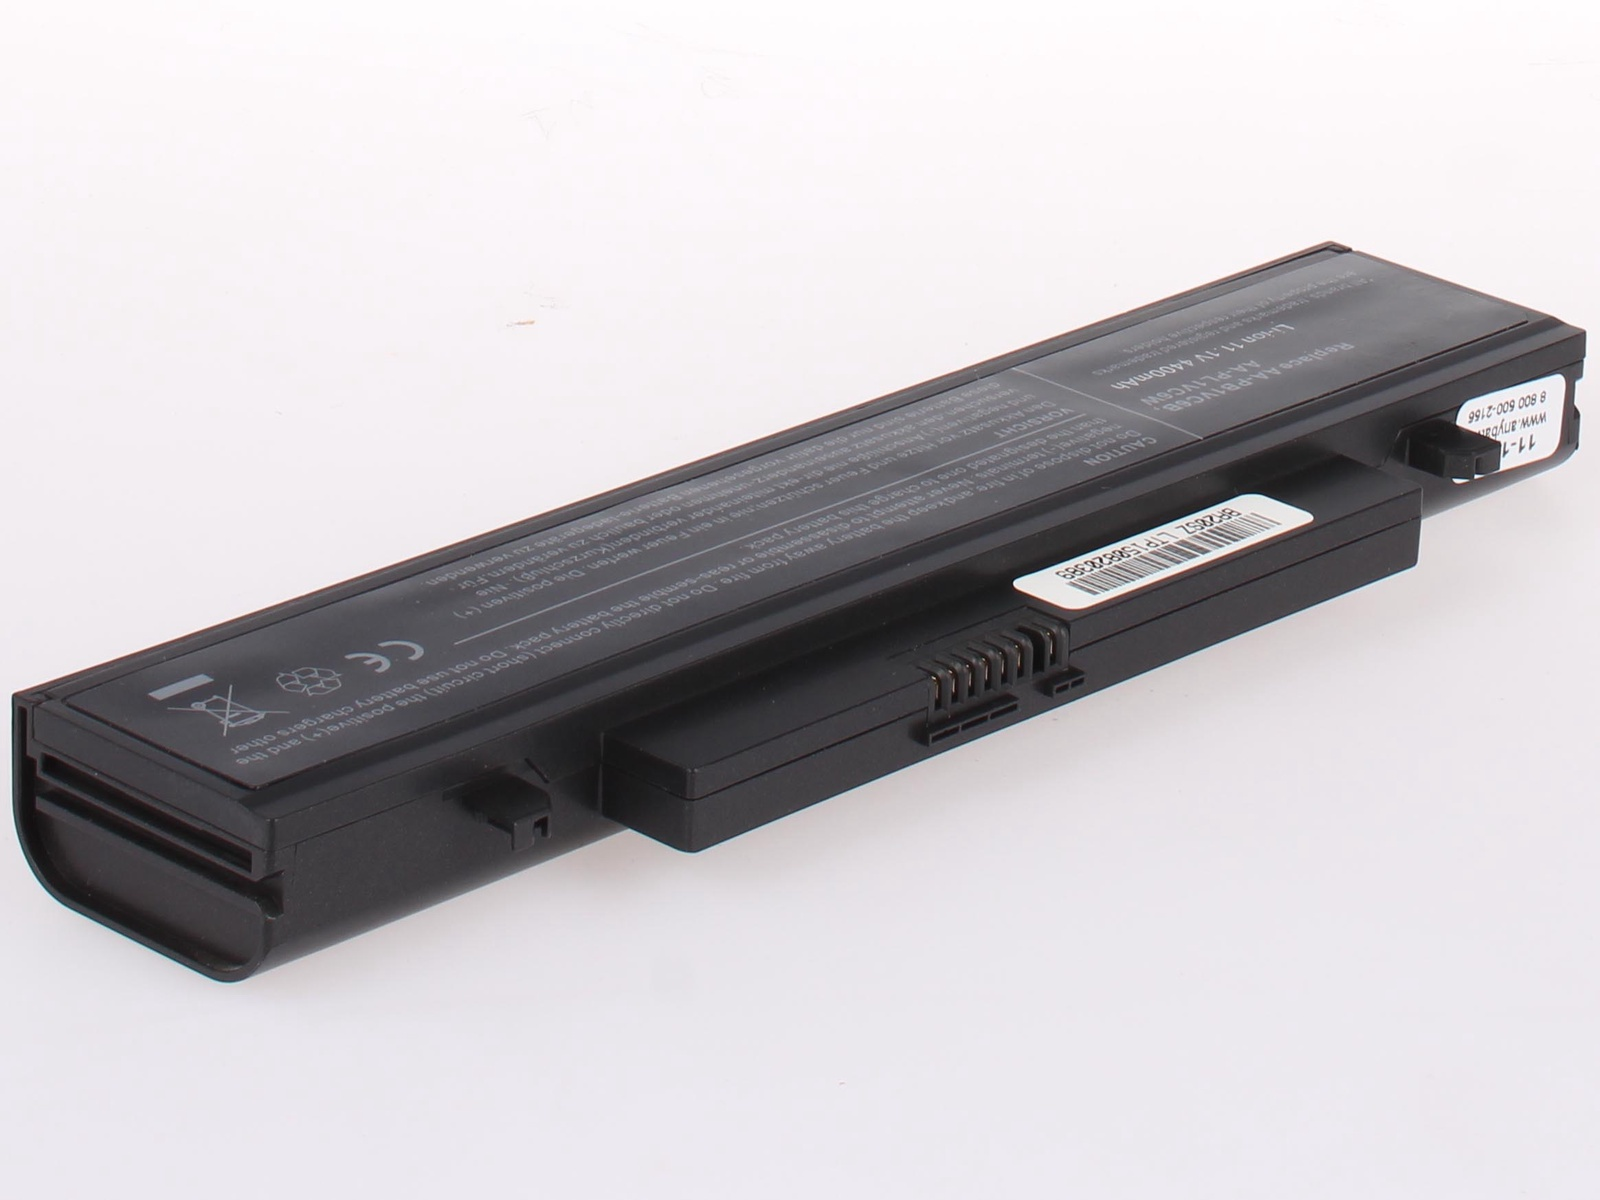 Аккумулятор для ноутбука AnyBatt Samsung AA-PB1VC6B, AA-PL1VC6W скачать драйвера для ноутбука samsung